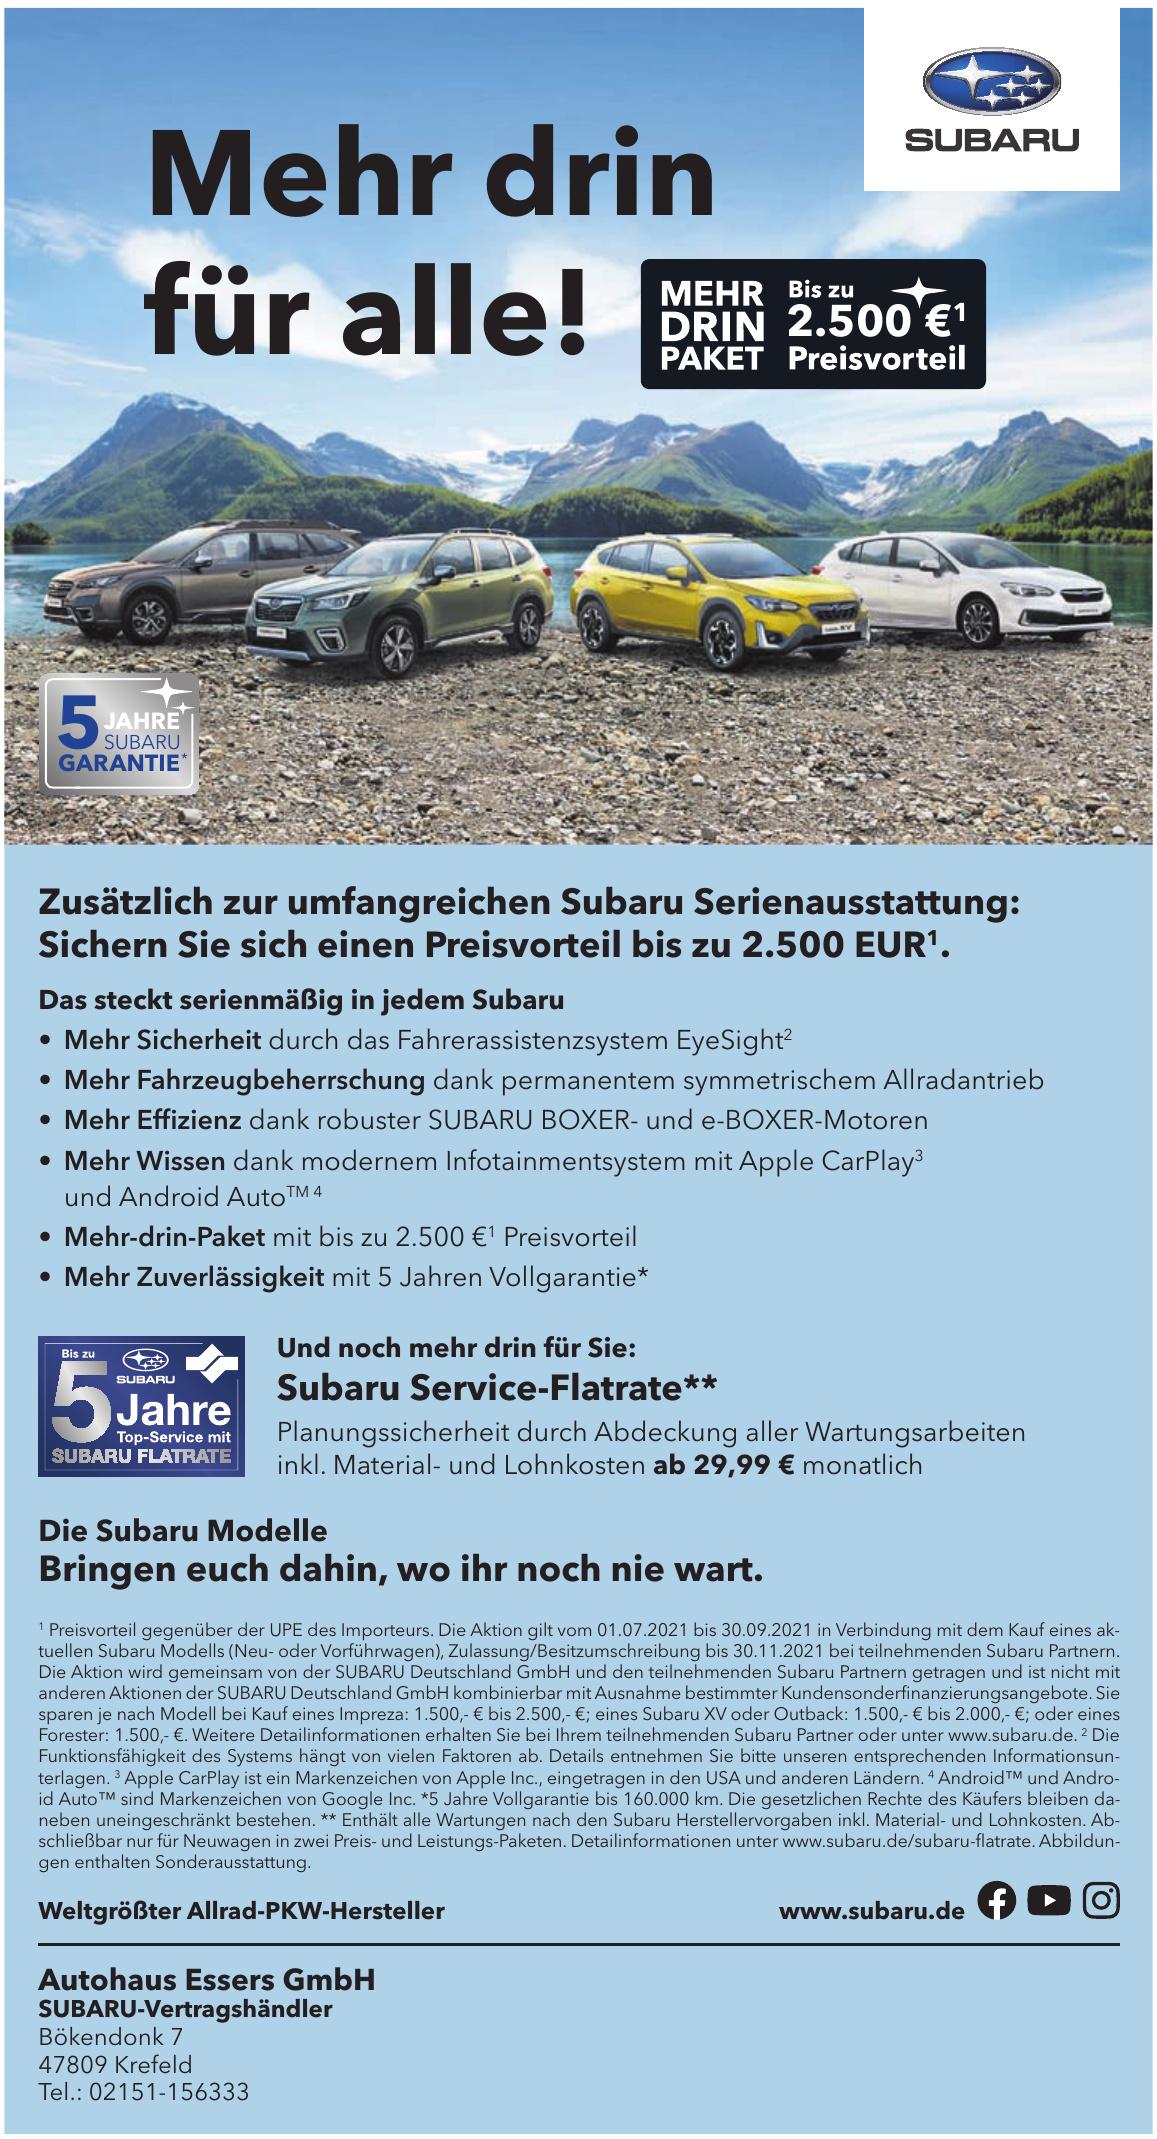 Autohaus Essers GmbH SUBARU-Vertragshändler